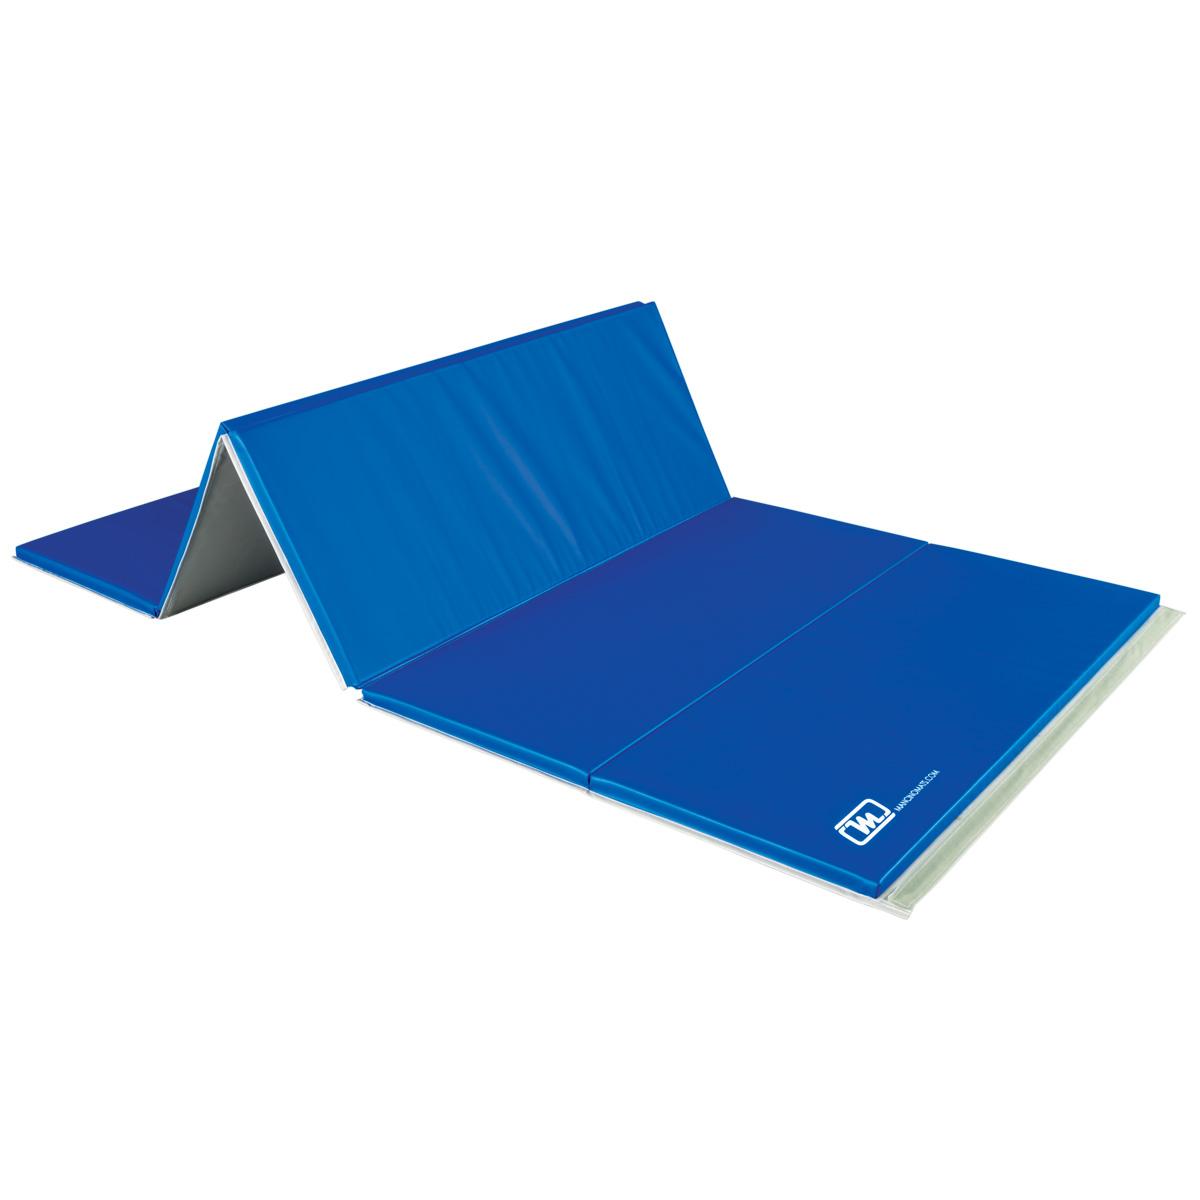 "2-1/8"" combo-foam best folding panel mats"